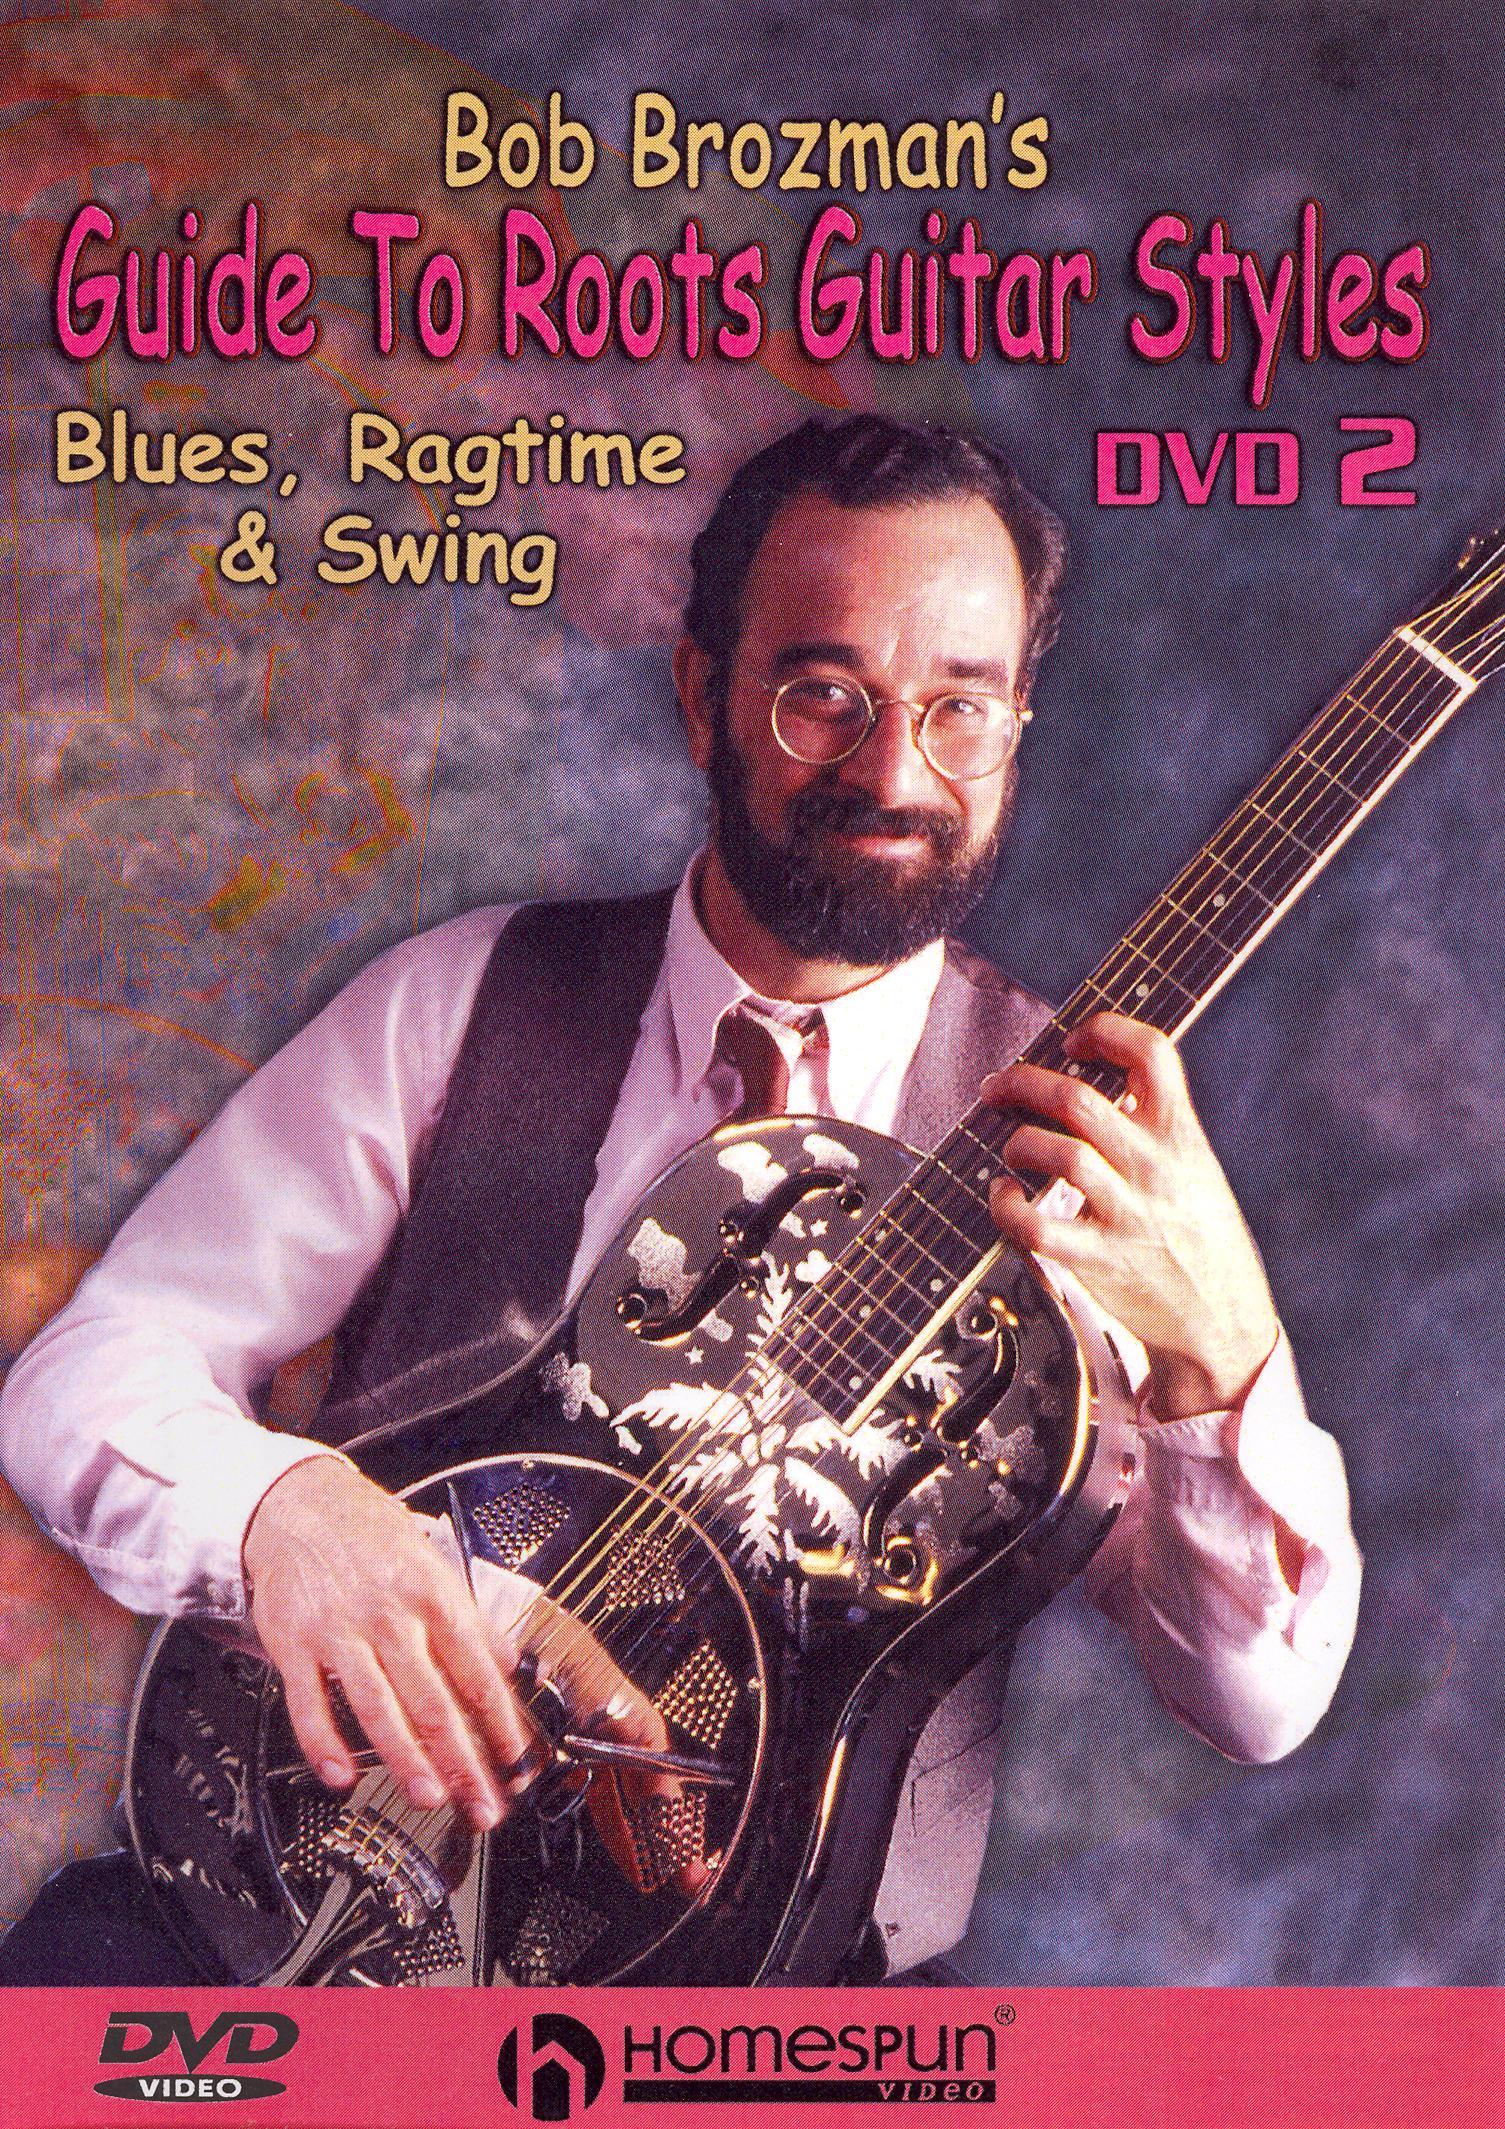 Bob Brozman's Guide to Roots Guitar Styles, Vol. 2